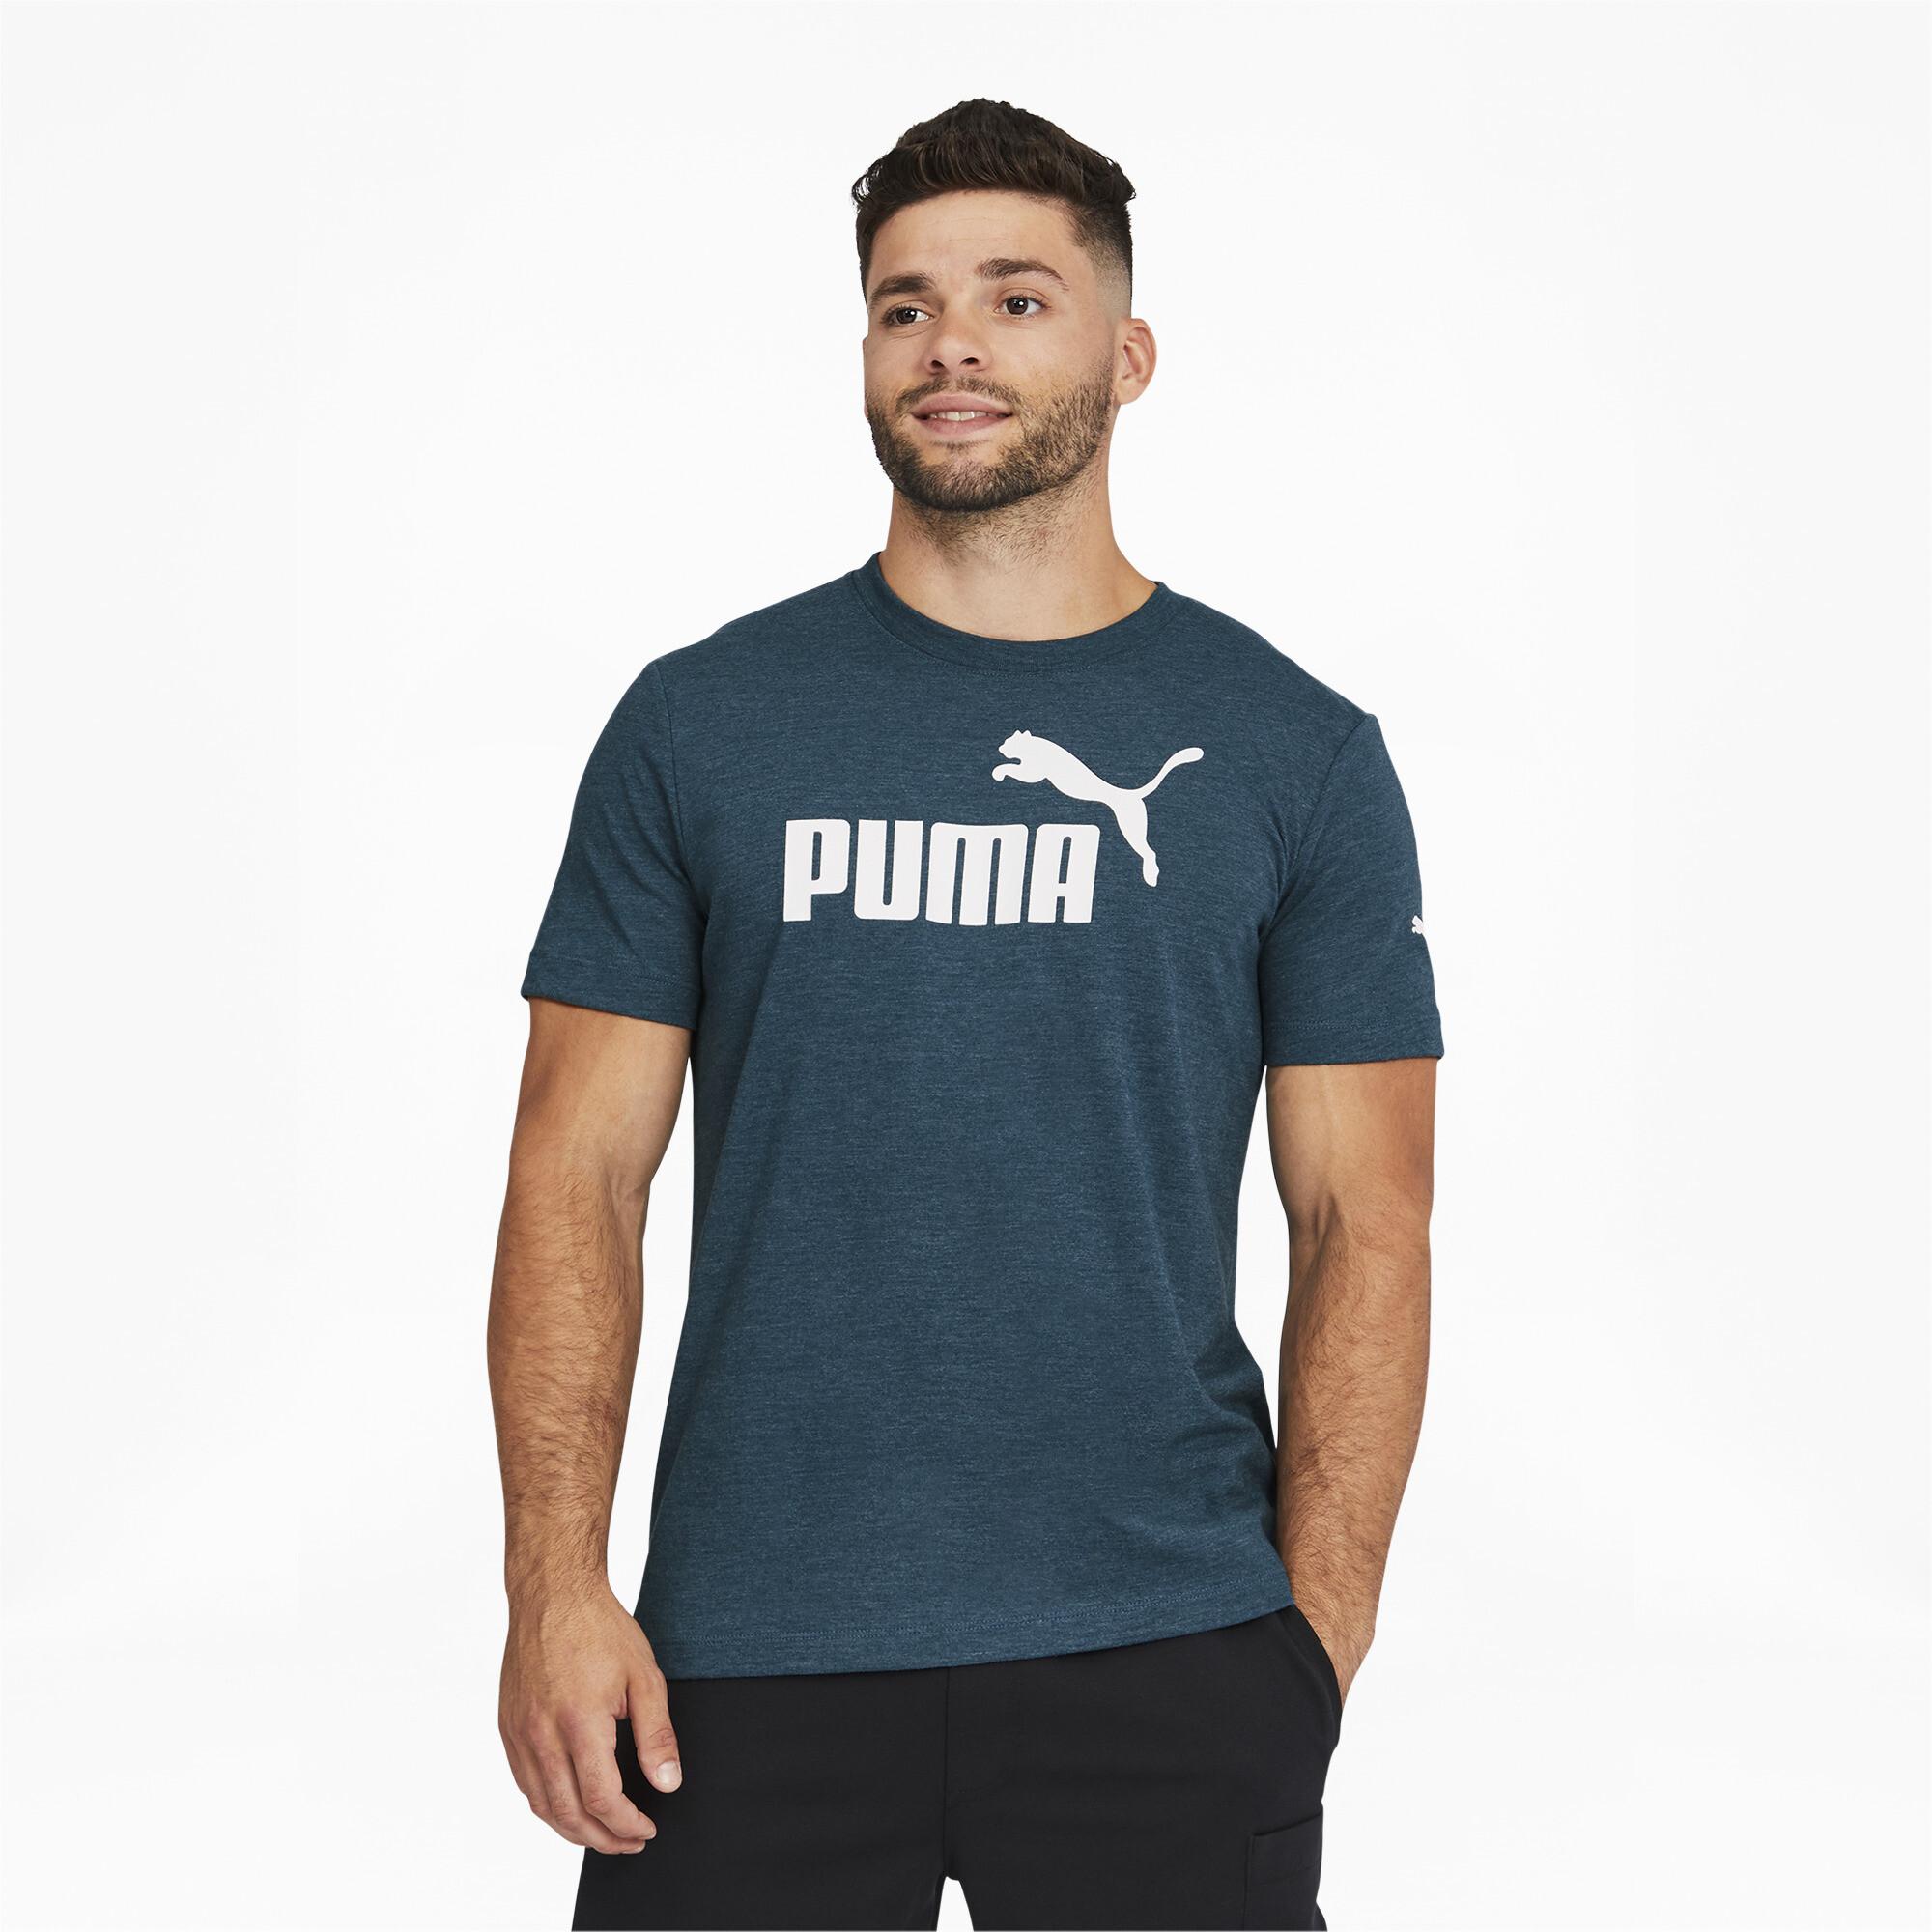 thumbnail 10 - PUMA Men's Essentials Heather Tee